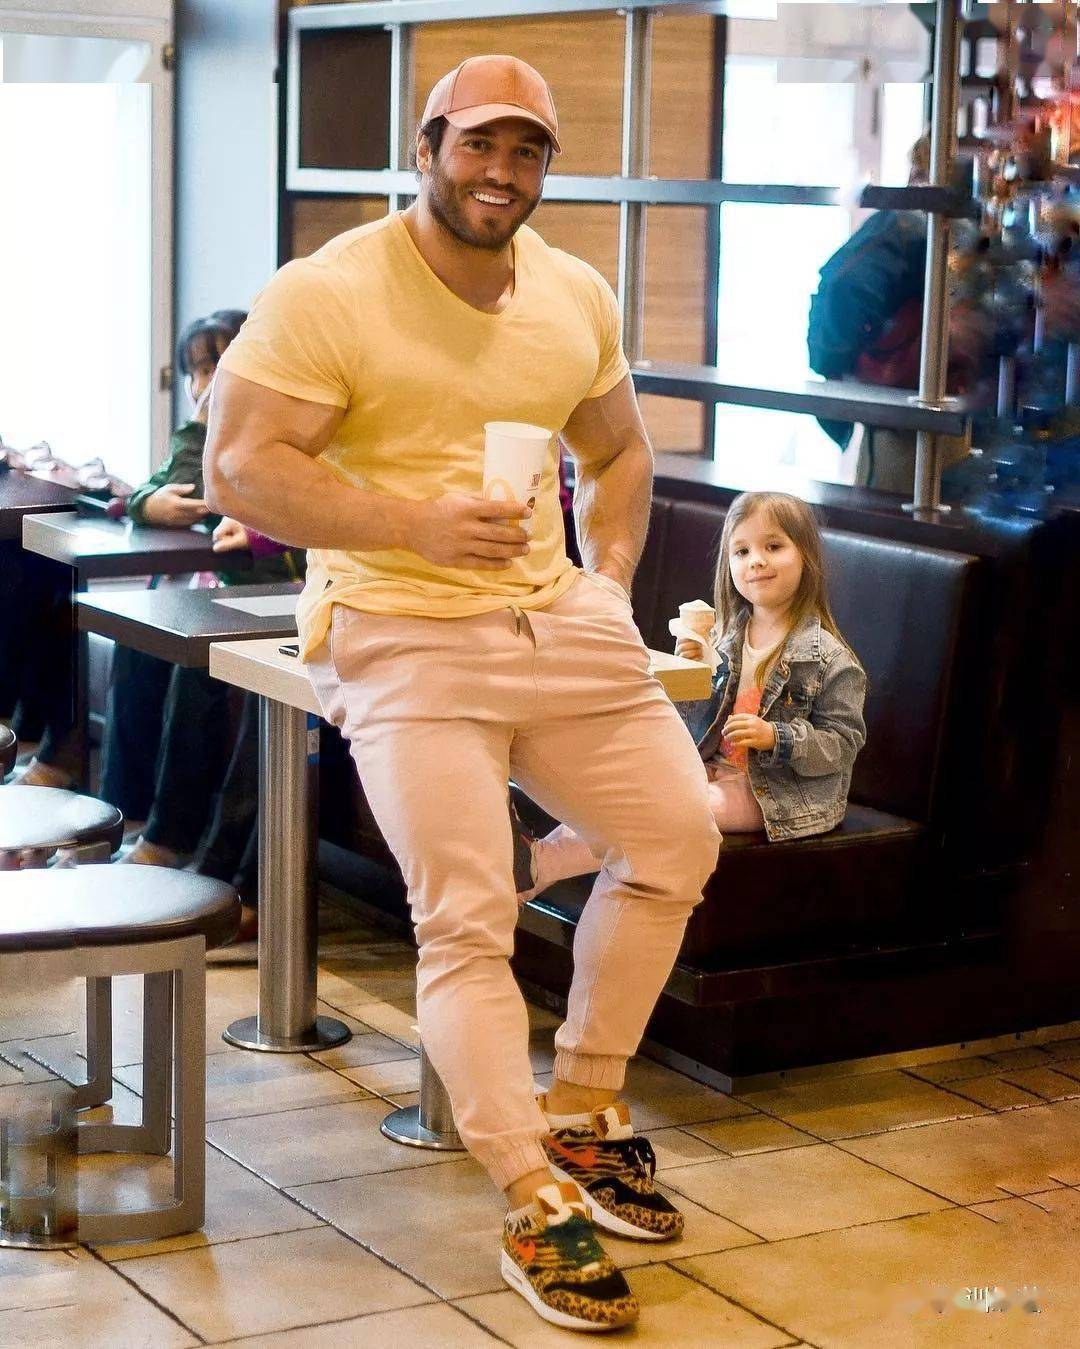 55cm臂围的肌肉硬汉,看了他的奶爸日常,我都想生娃了 初级健身 第13张